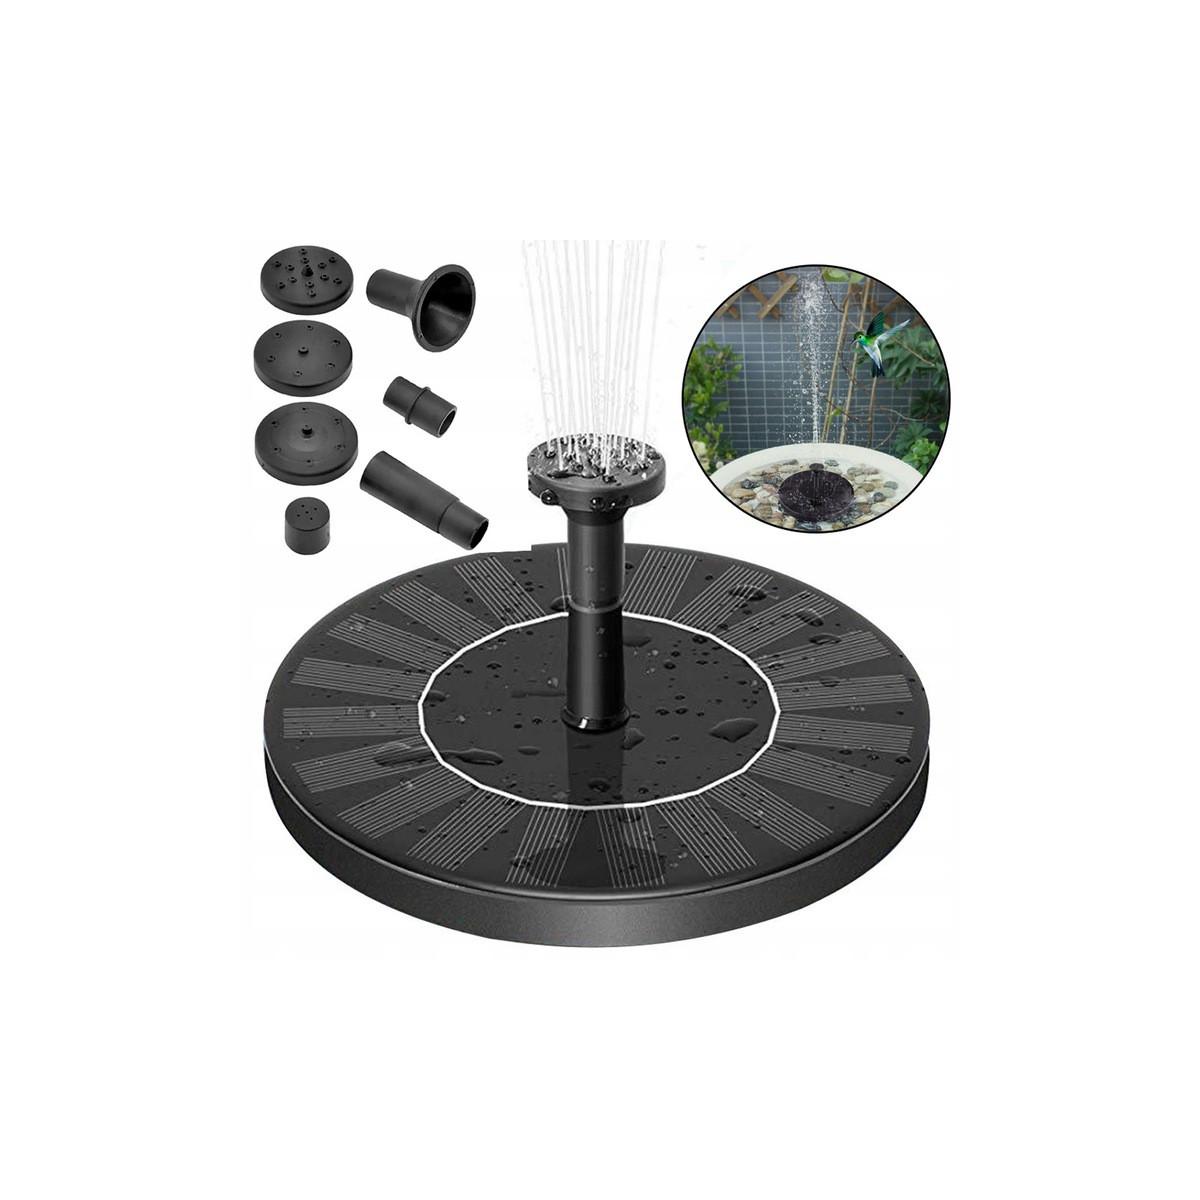 Fontanna ogrodowa solarna AUR-TYNPQD05